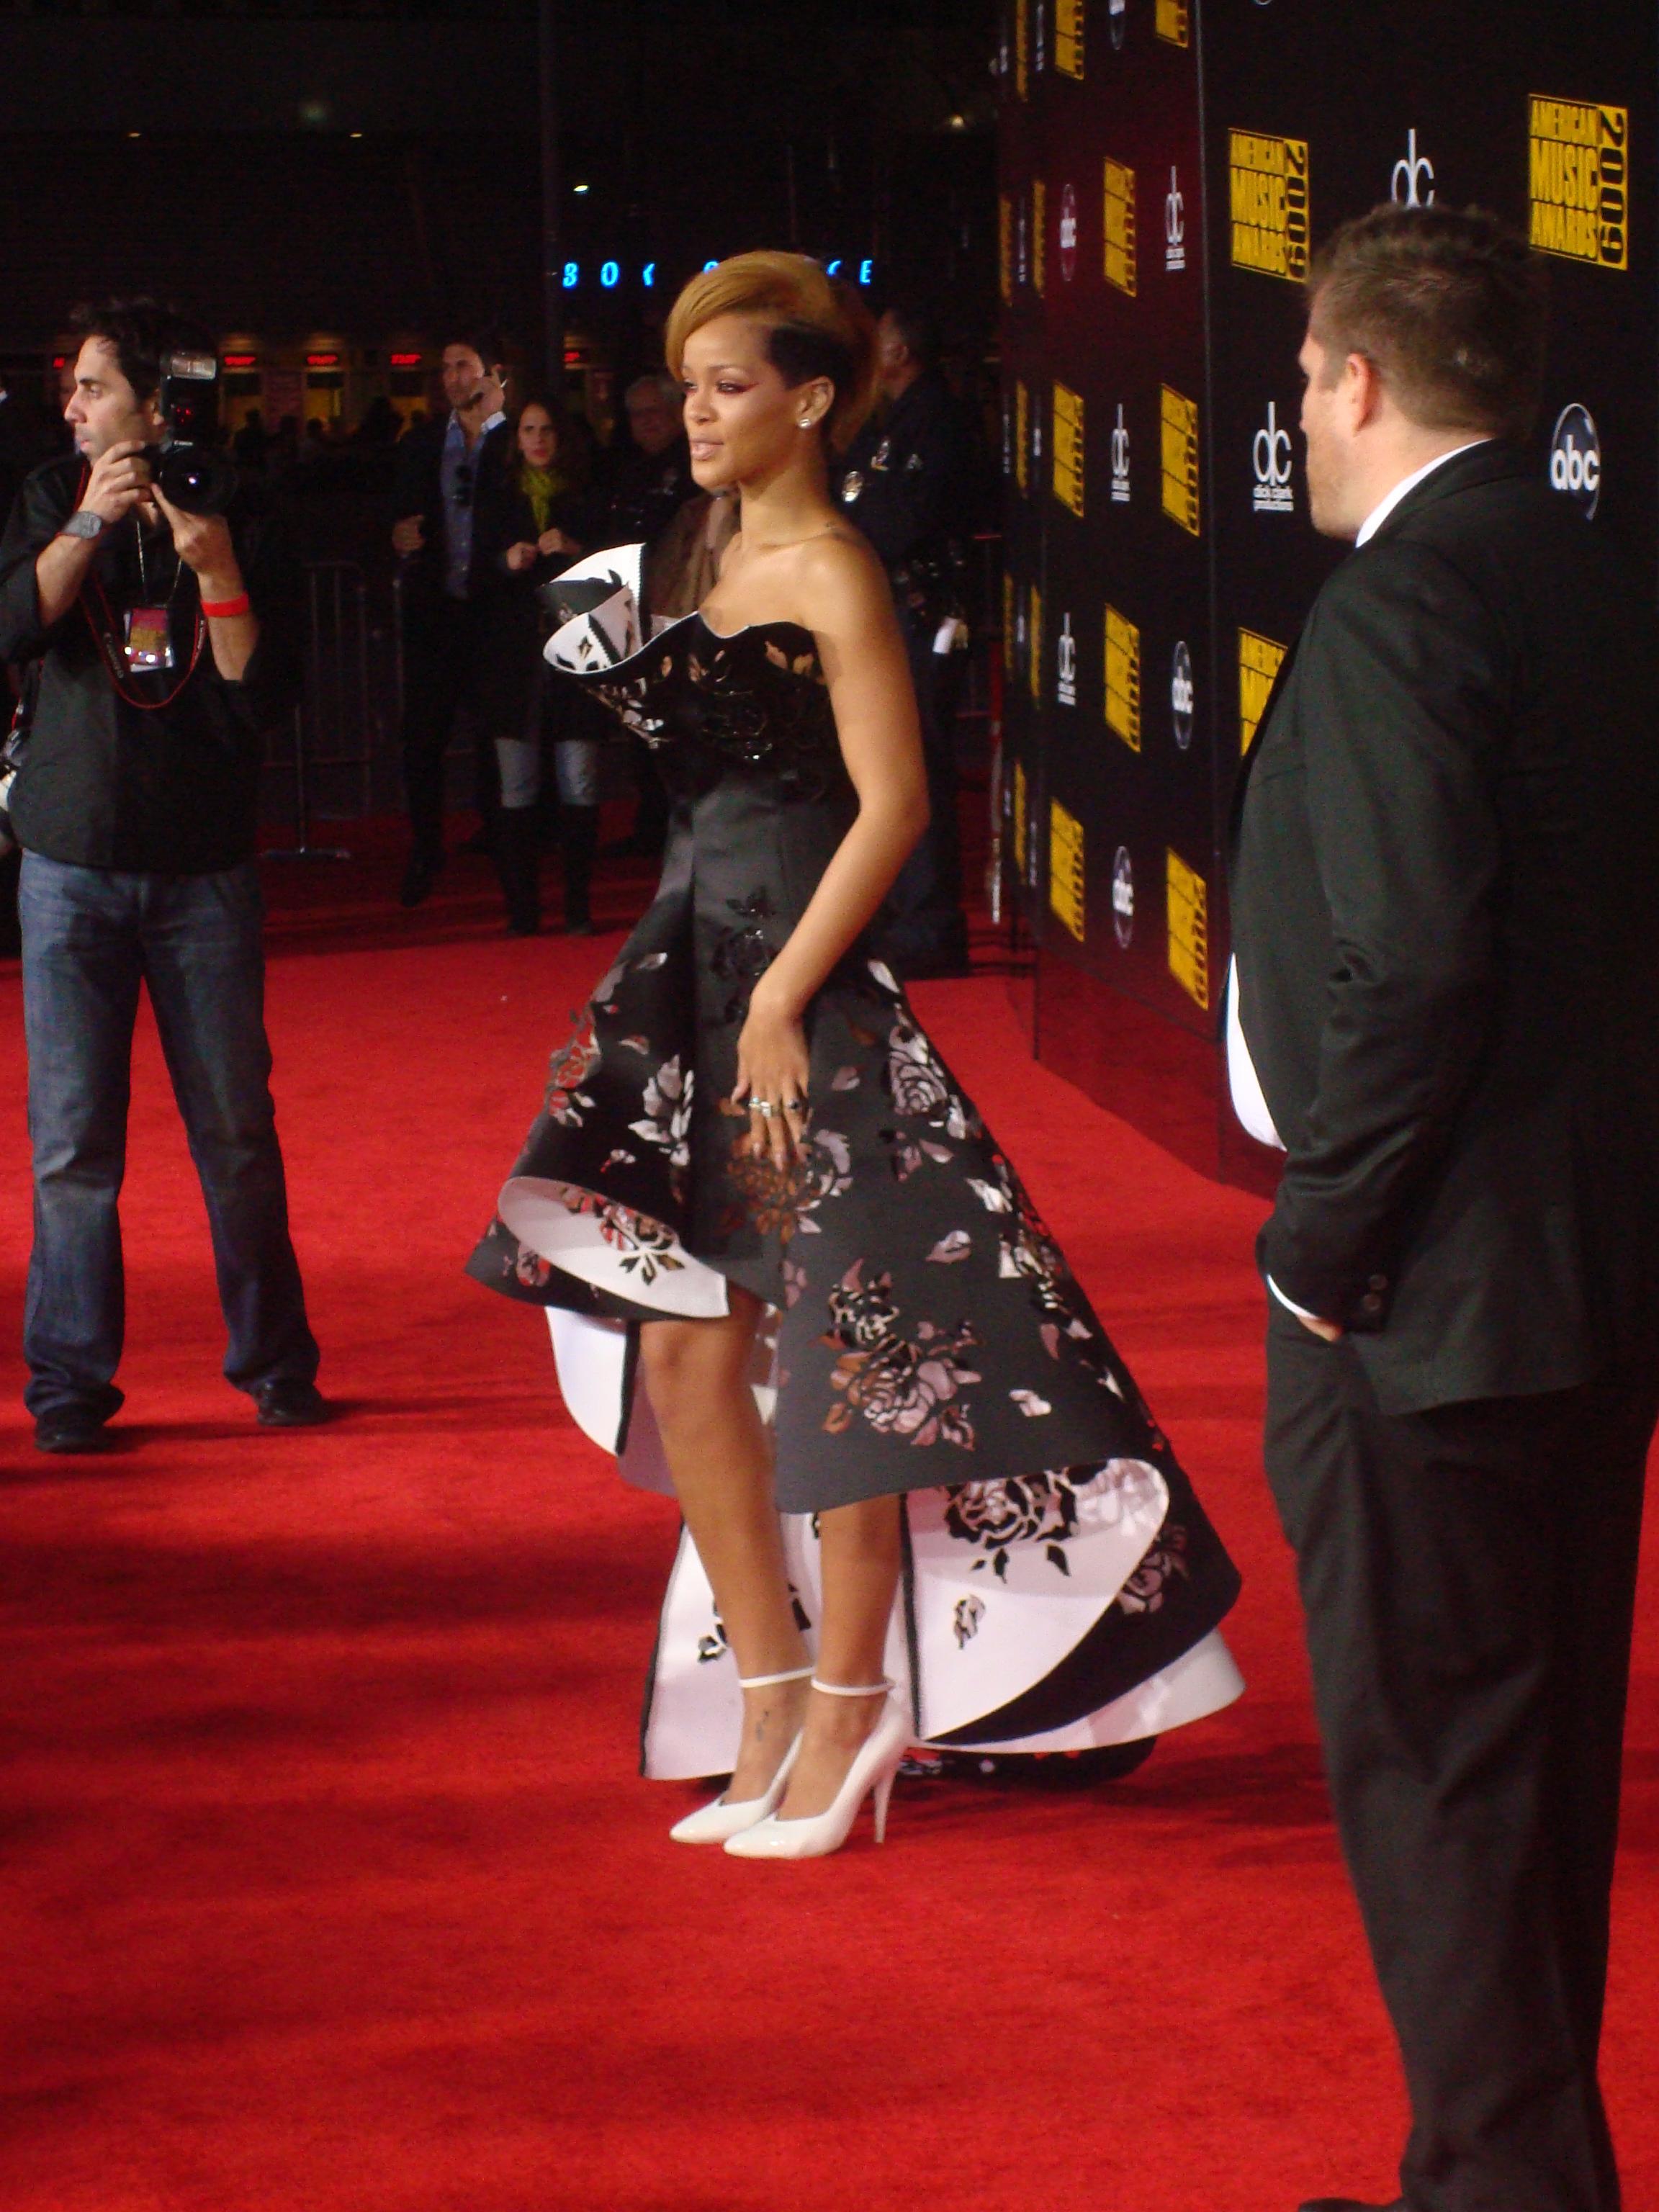 File:Rihanna 2009 AMA.jpg - Wikimedia Commons Rihanna Work